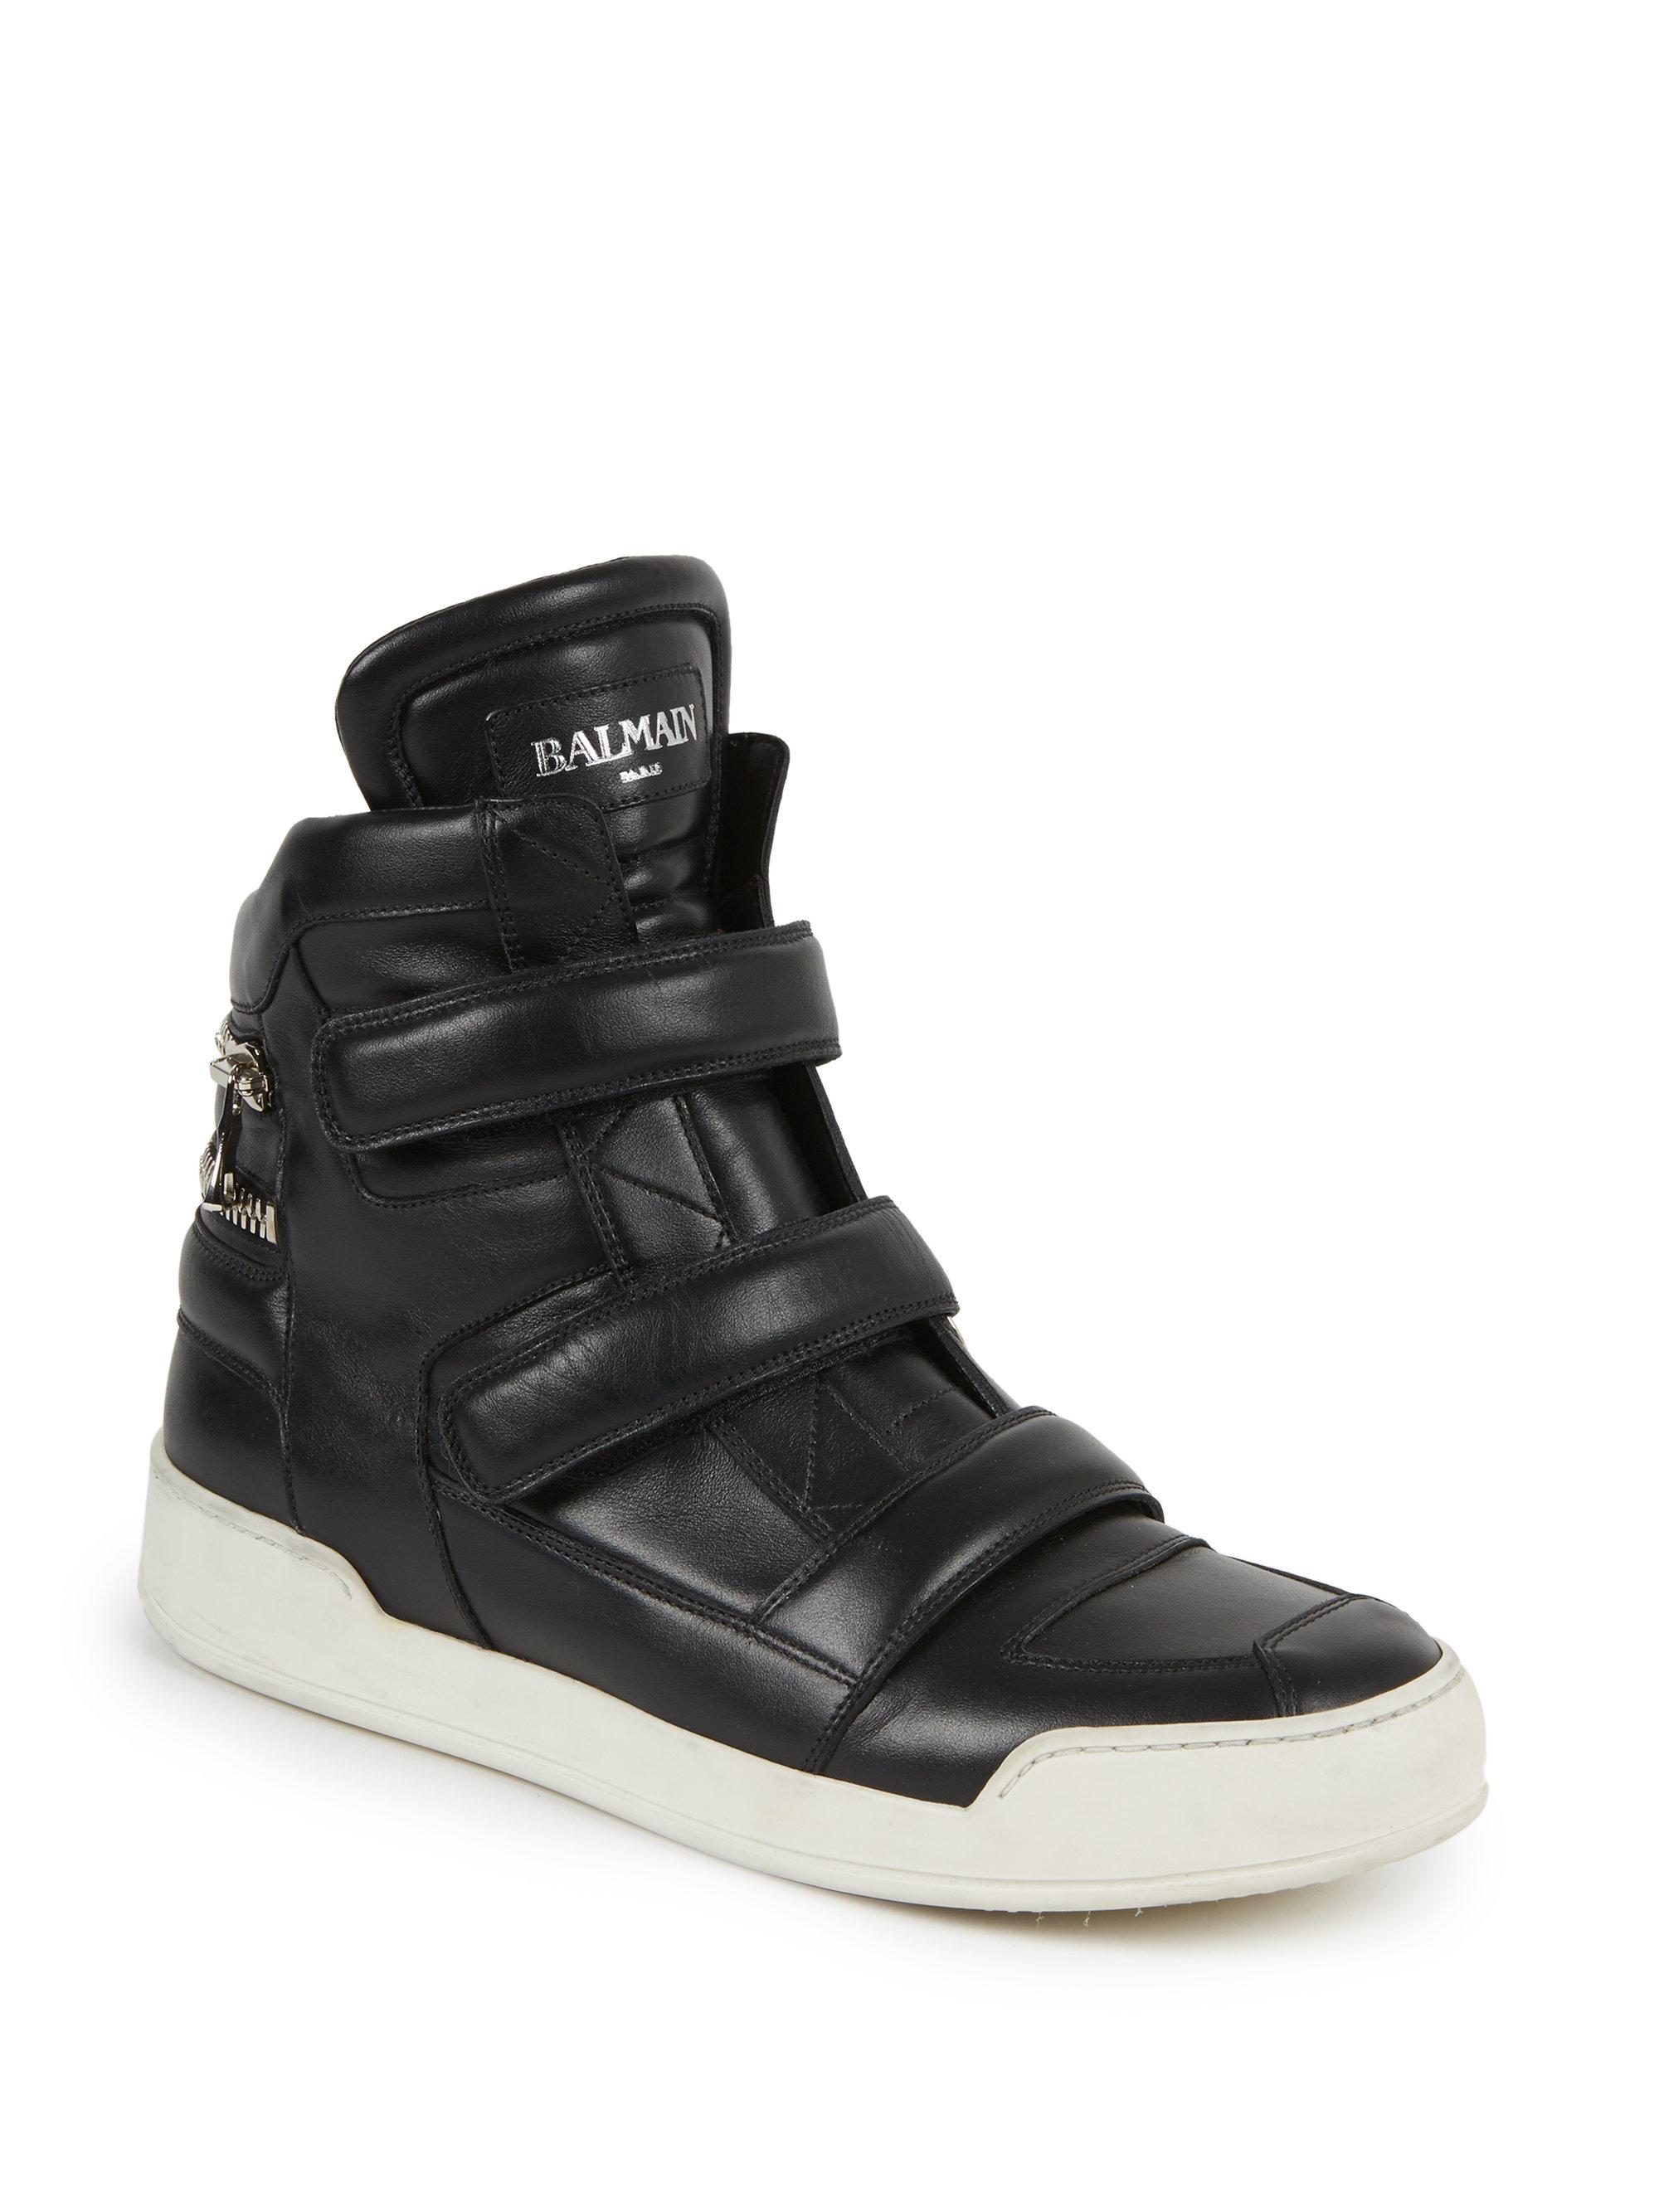 Balmain Zip Detail Leather High Top Sneakers In Black For